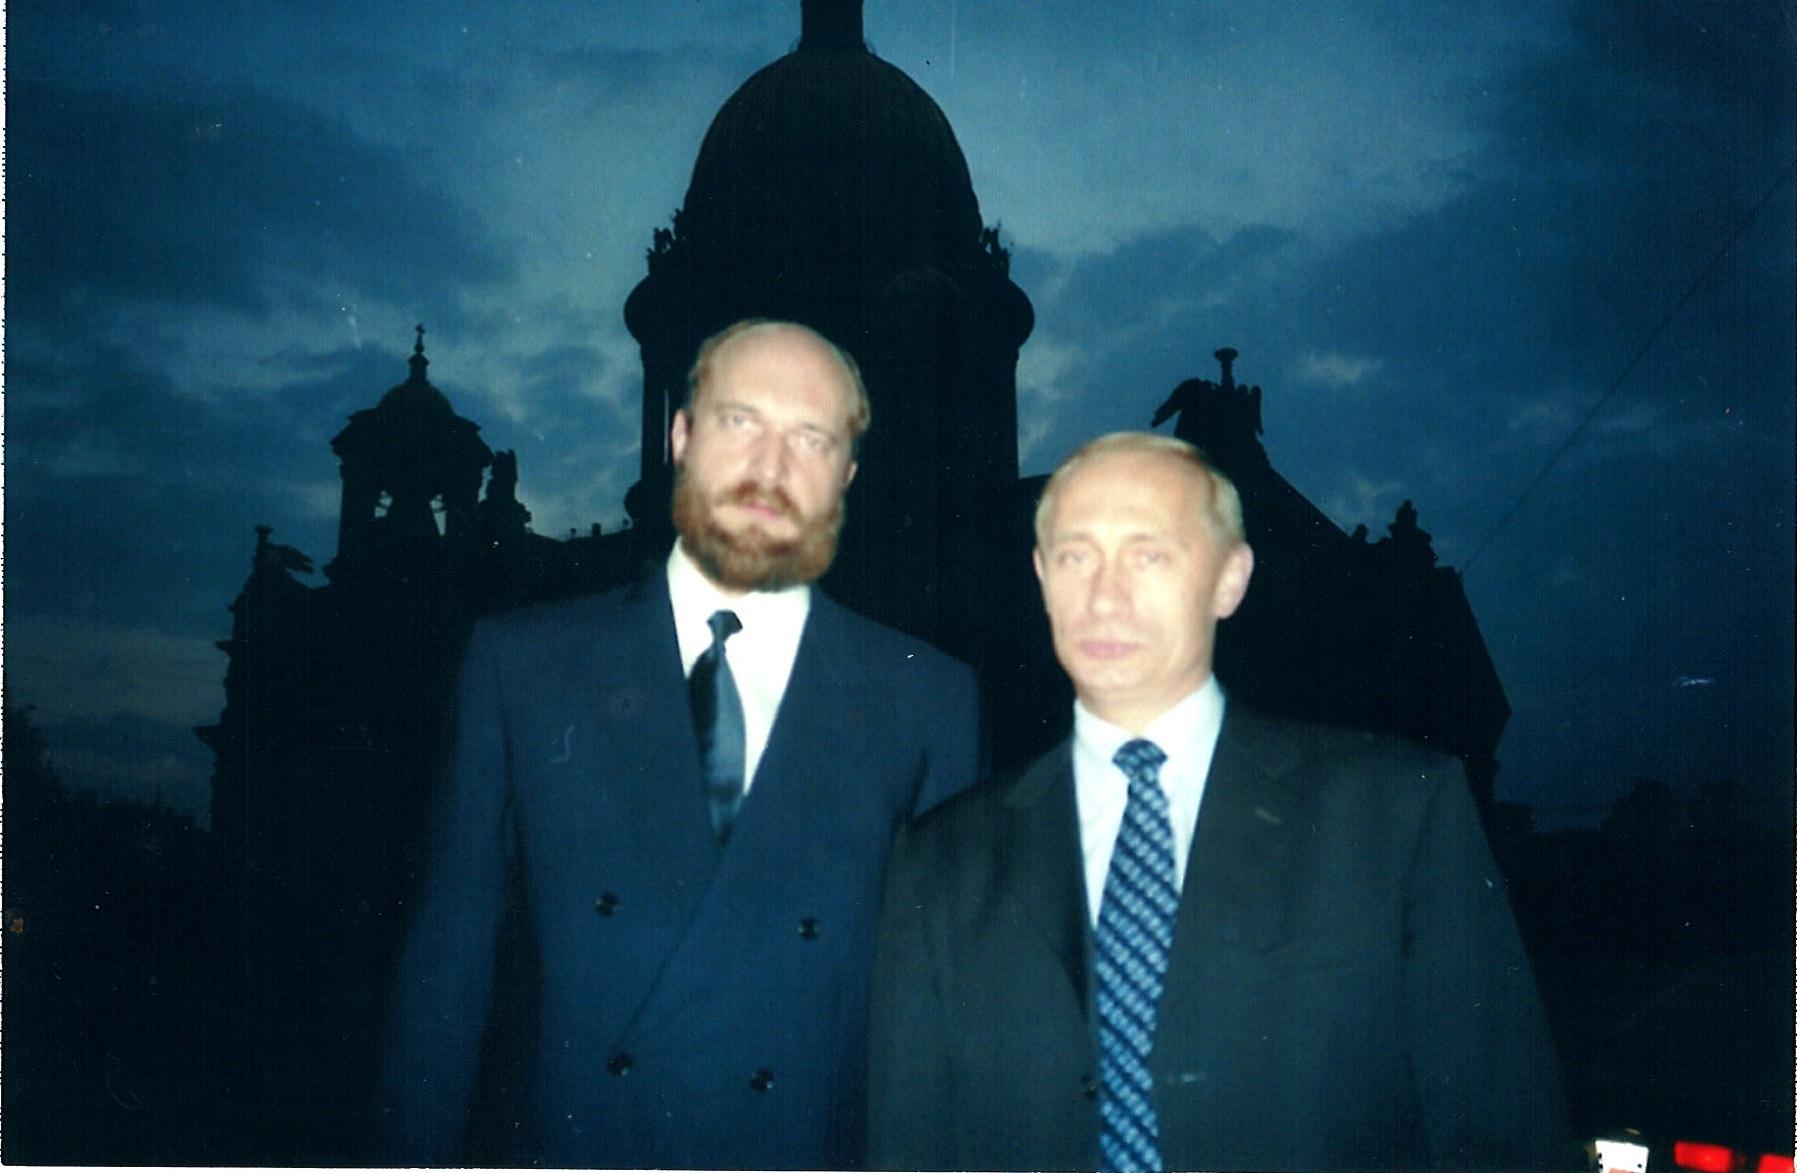 With Putin on ancestral homeland